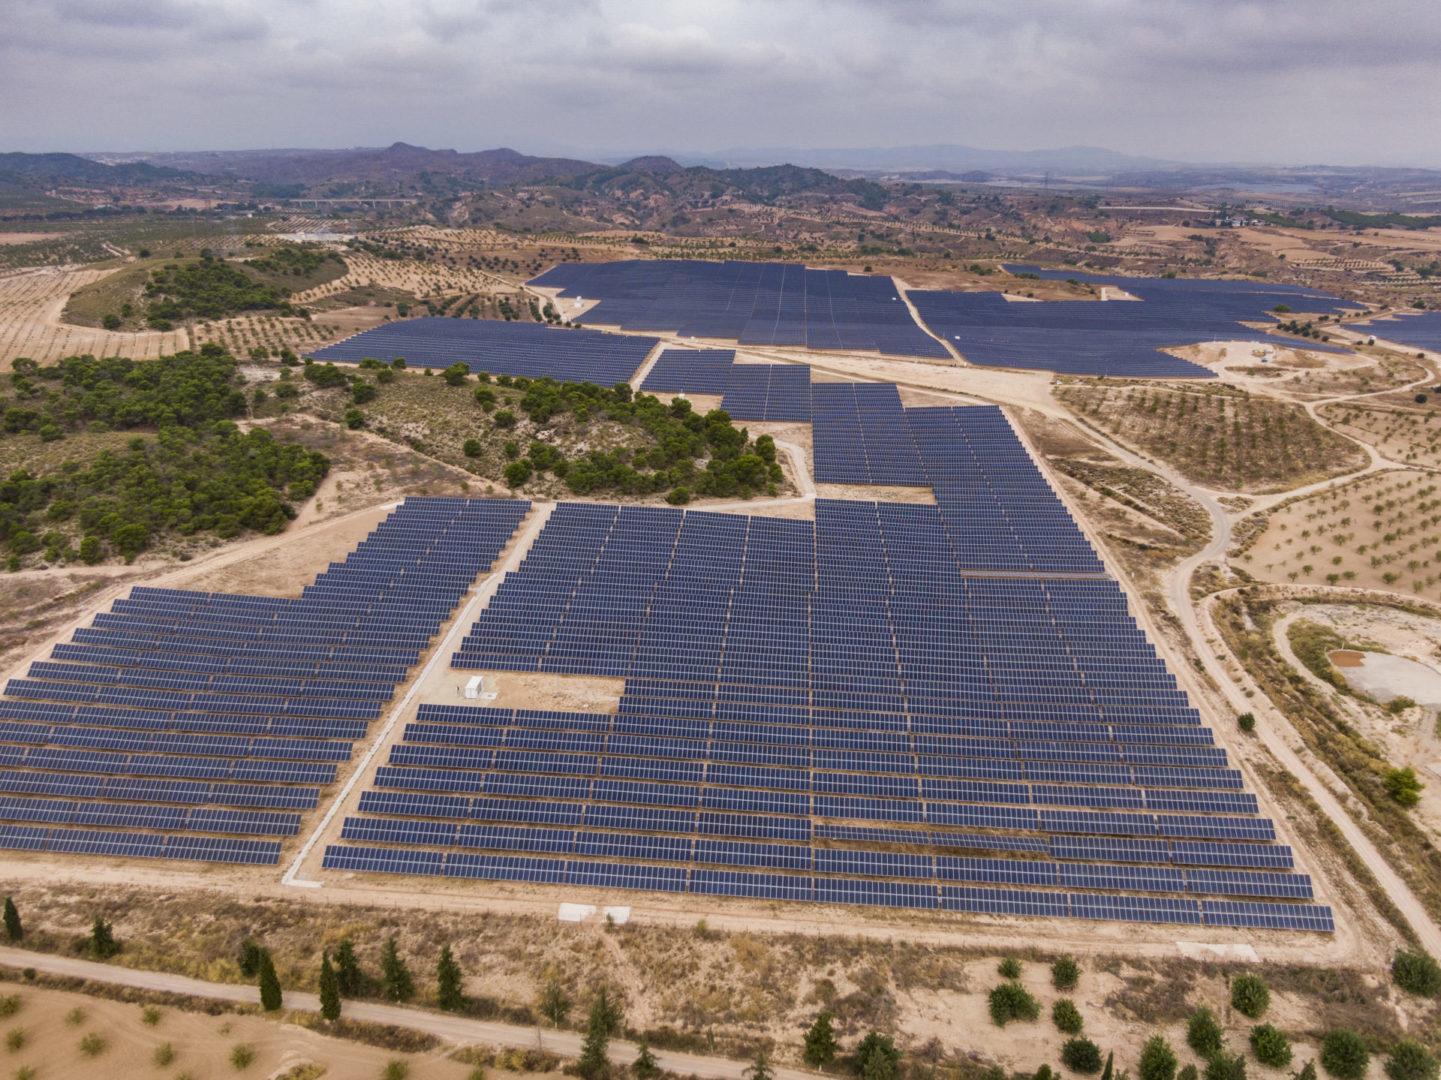 Planta Solar T Cotillas DJI_0864 Urdecon